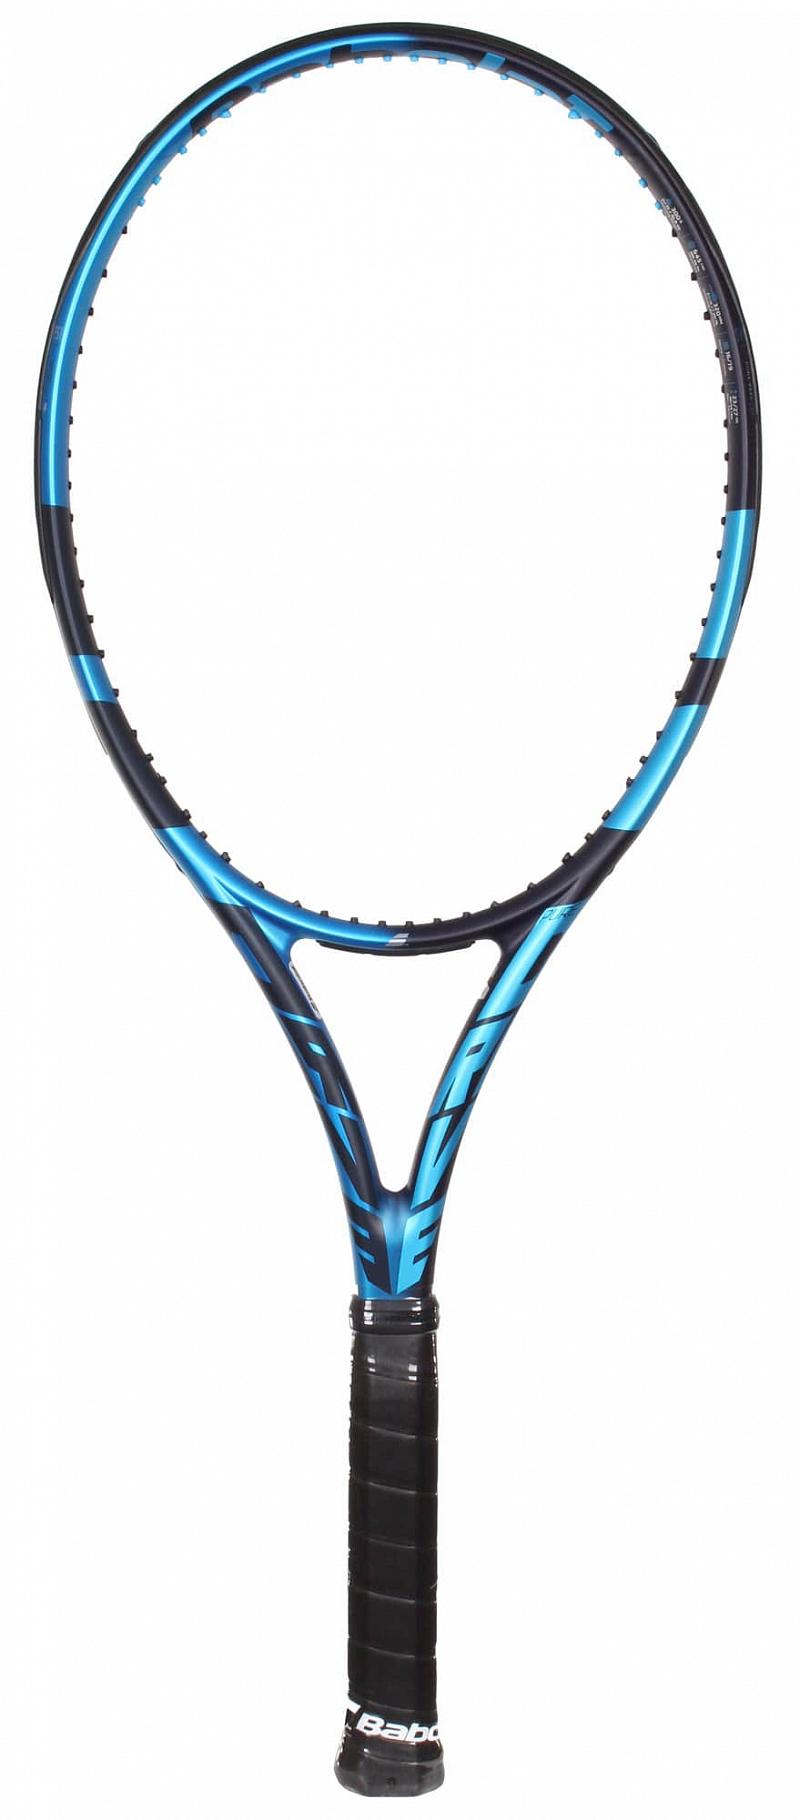 Pure Drive 2021 tenisová raketa grip: G4